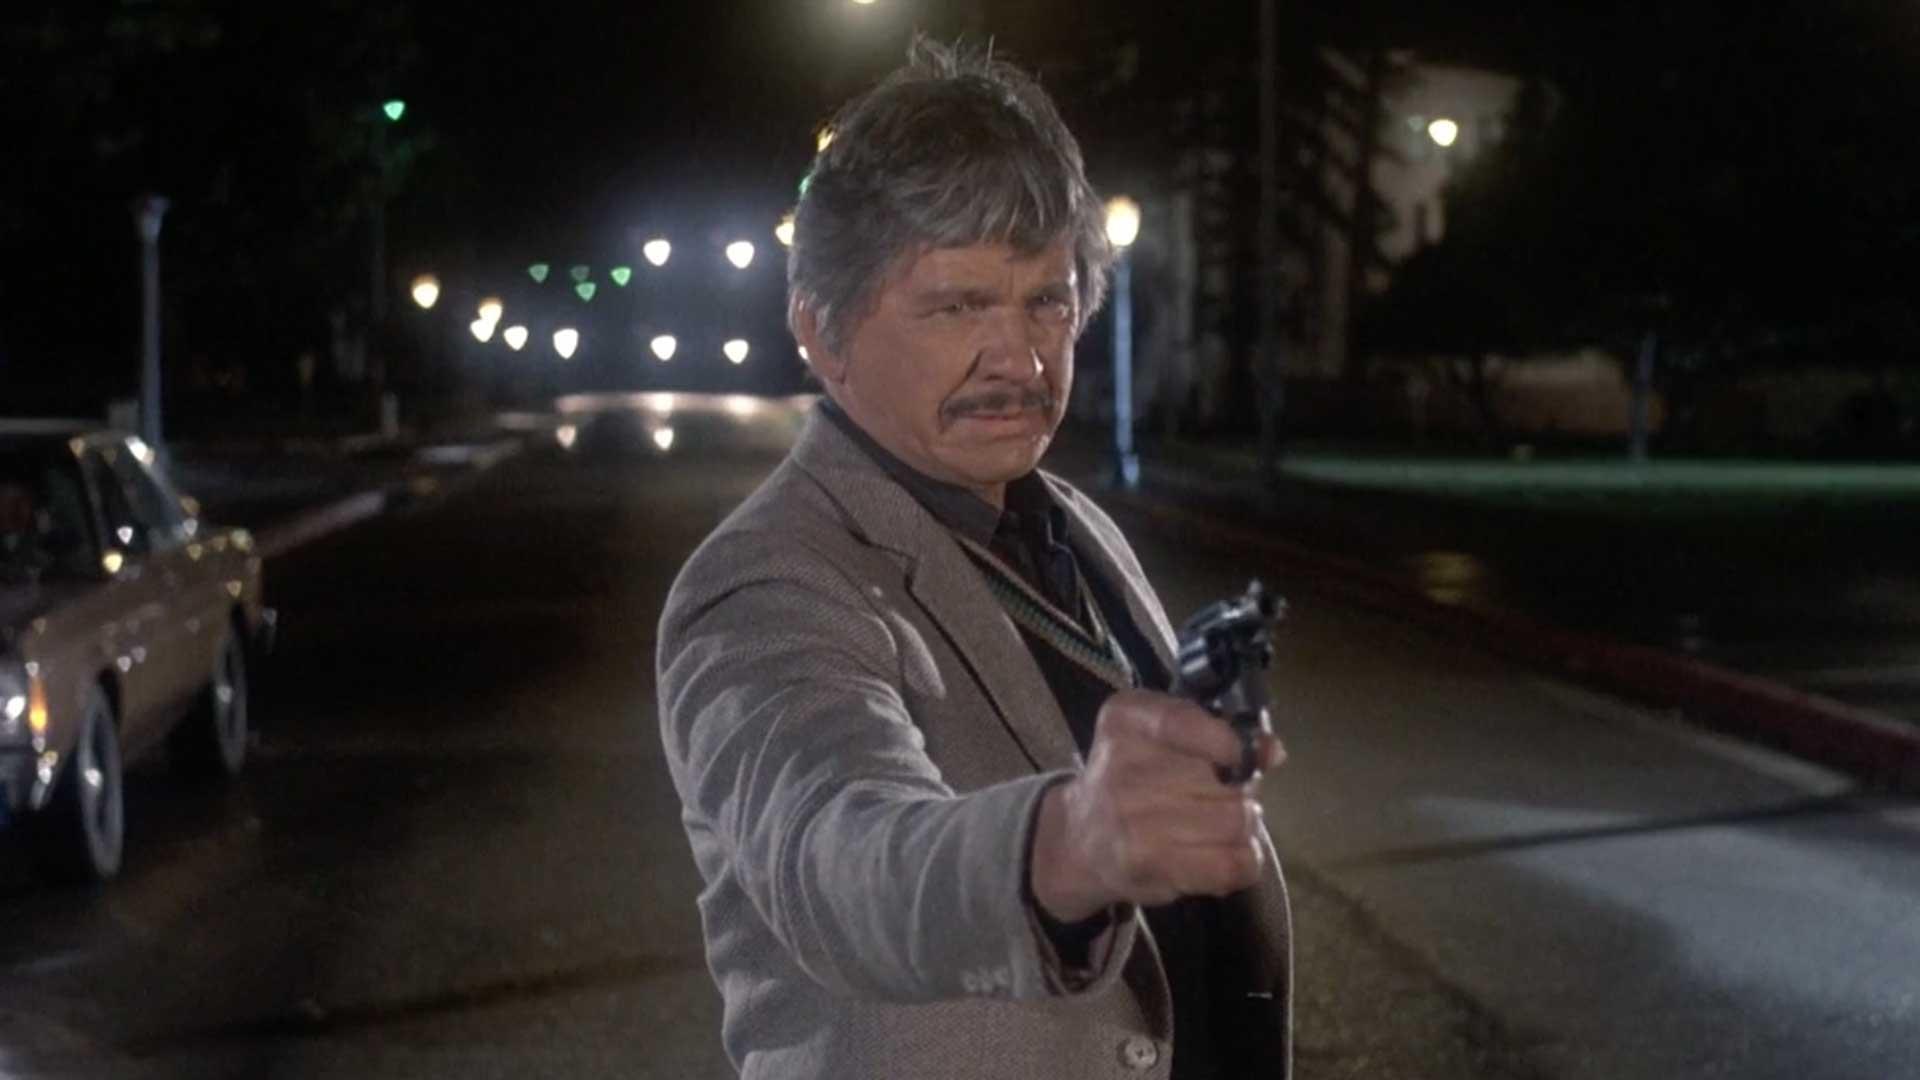 Charles-Bronson-10-To-Midnight-1983-thriller-slasher